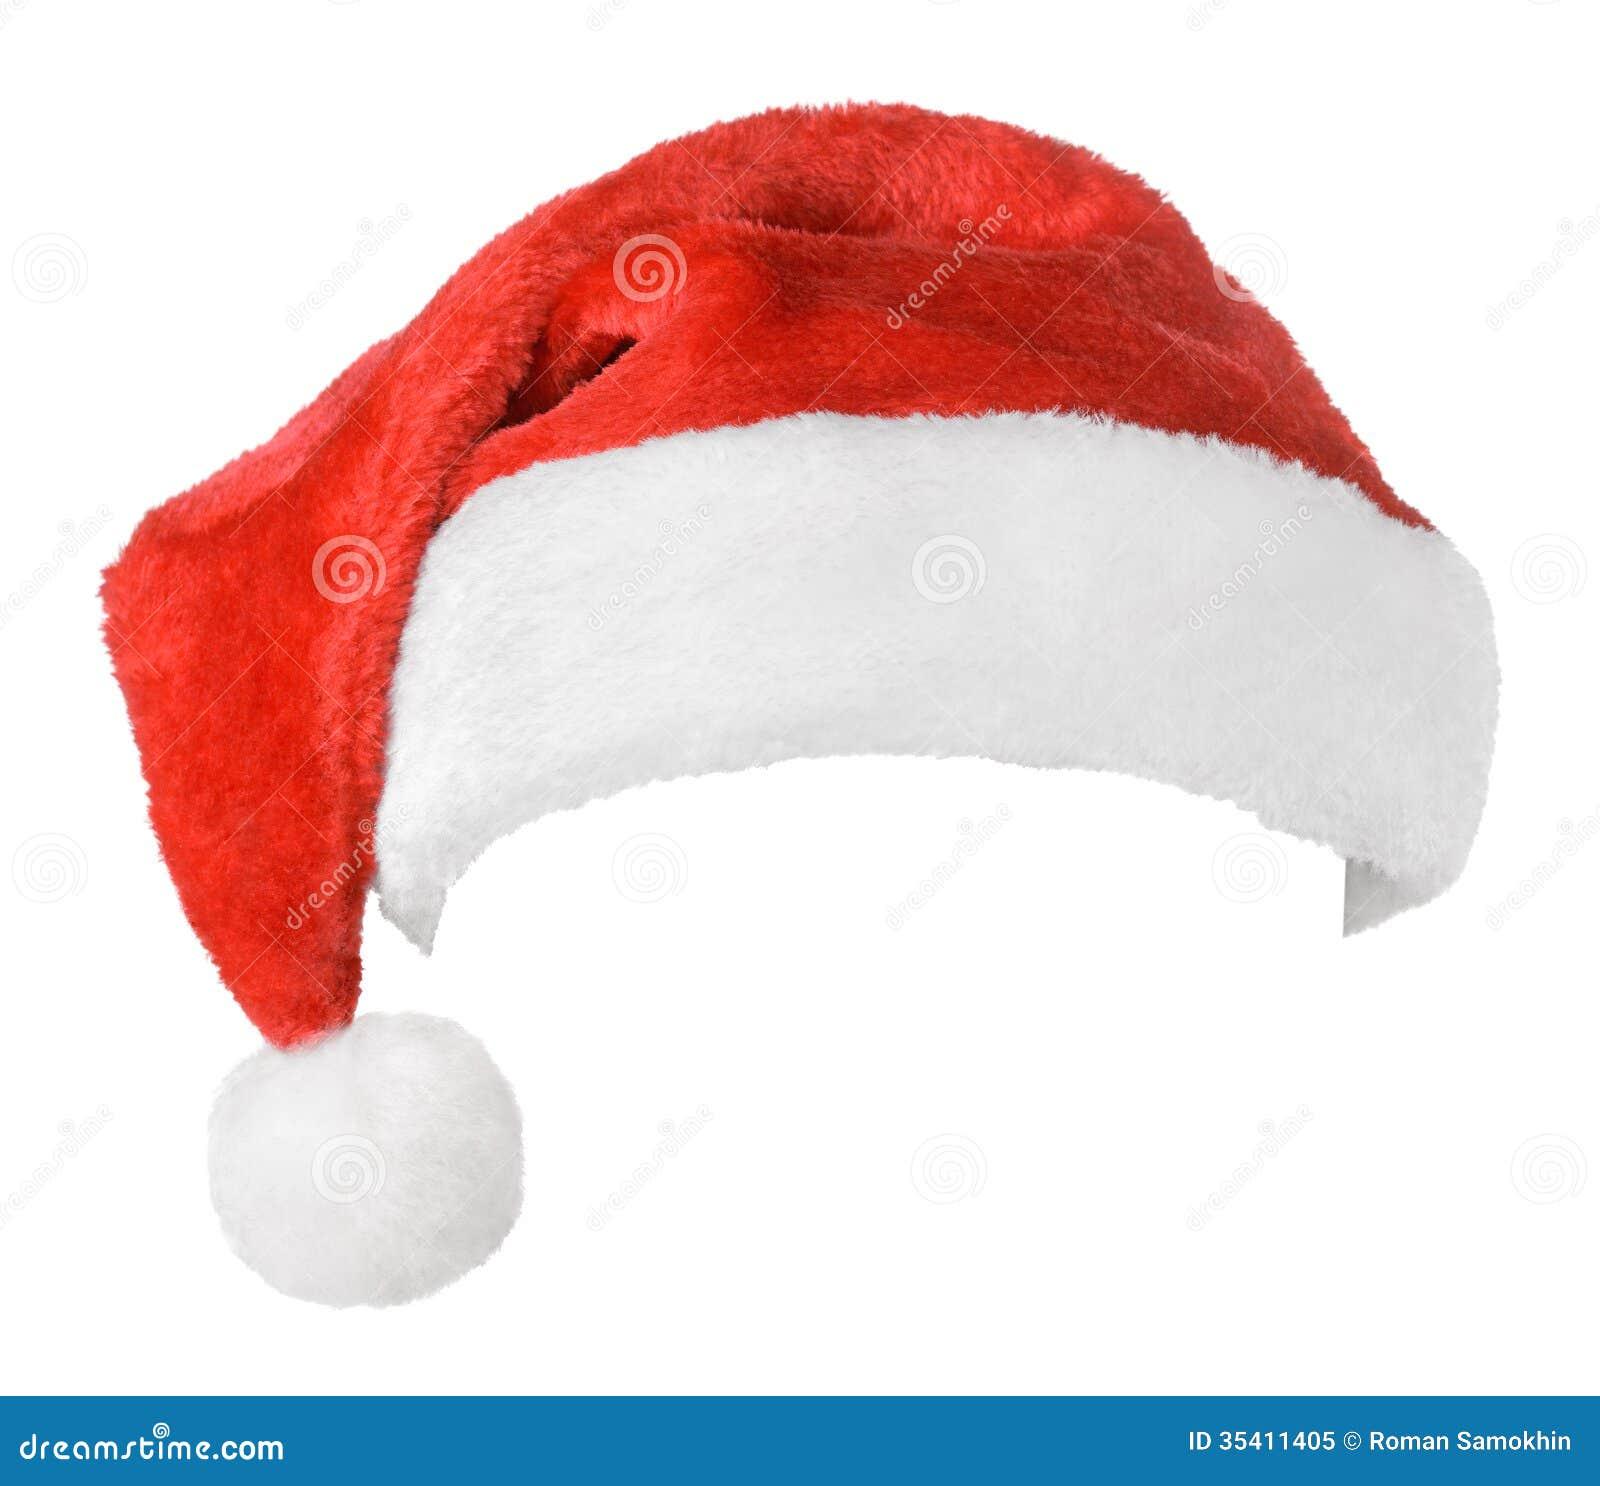 d6ad8e7c5f0 Santa Claus red hat stock image. Image of celebration - 35411405